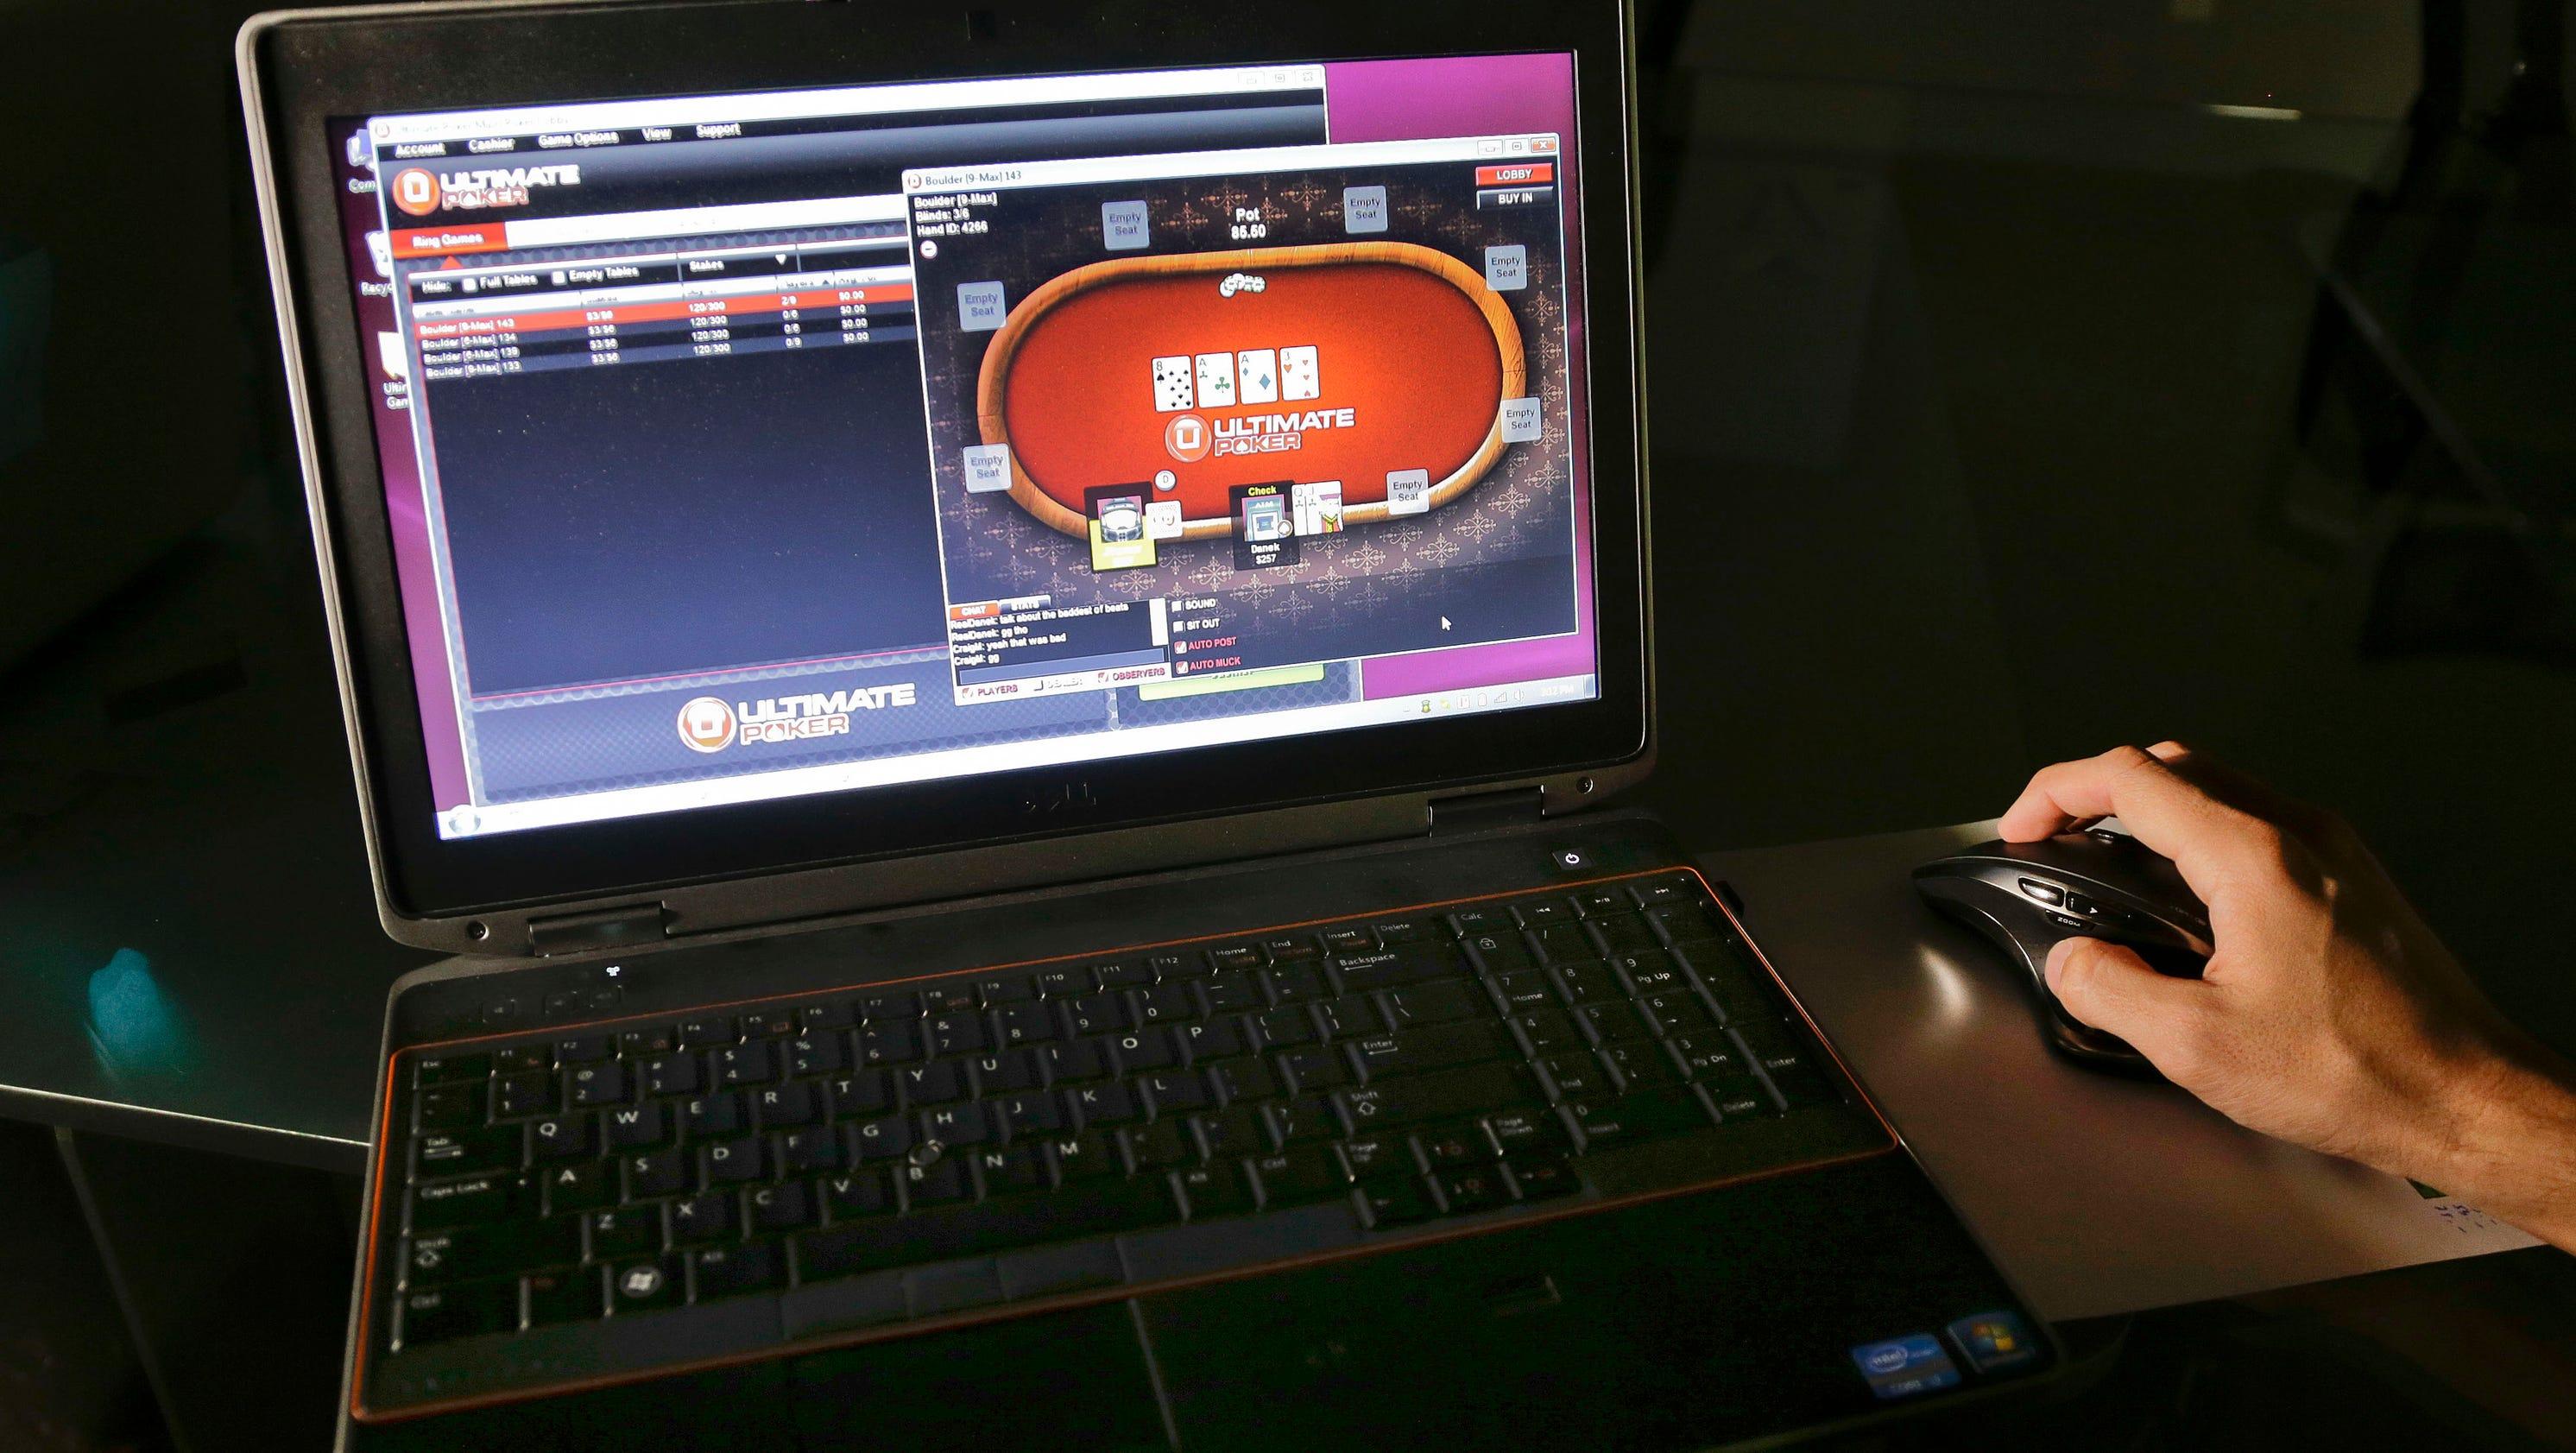 Laughlin nv gambling packages